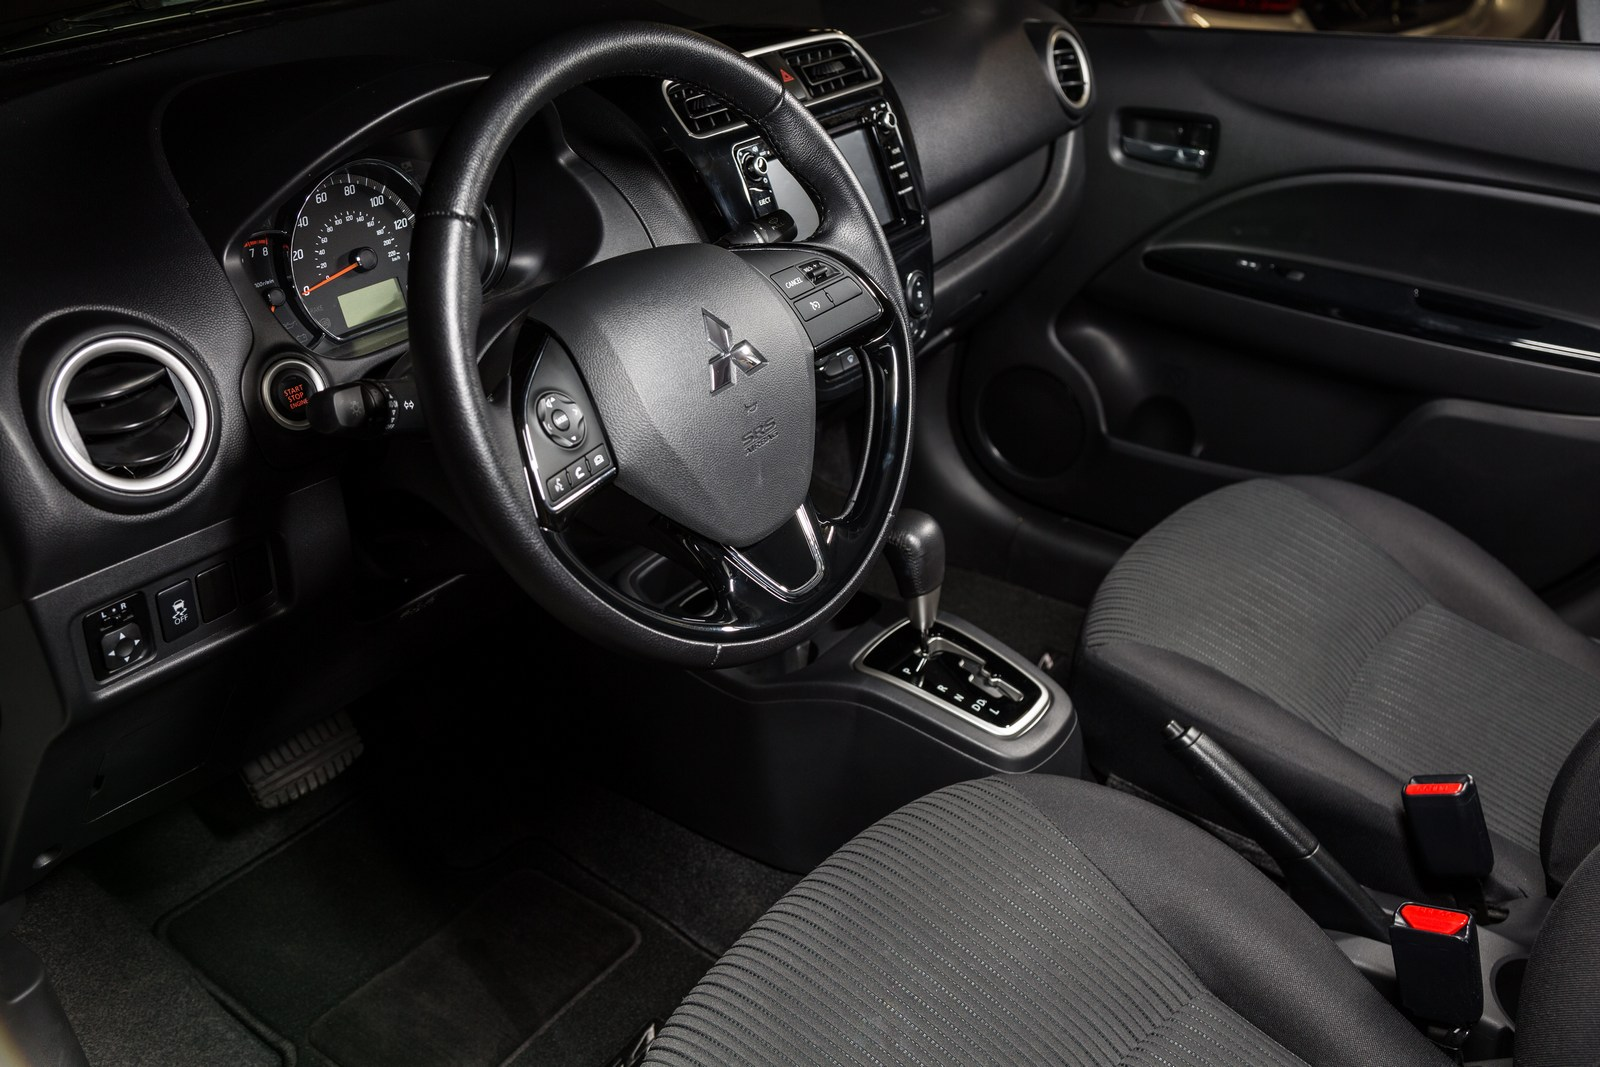 2018 Mitsubishi Mirage And Mirage G4 Gain A 7-Inch